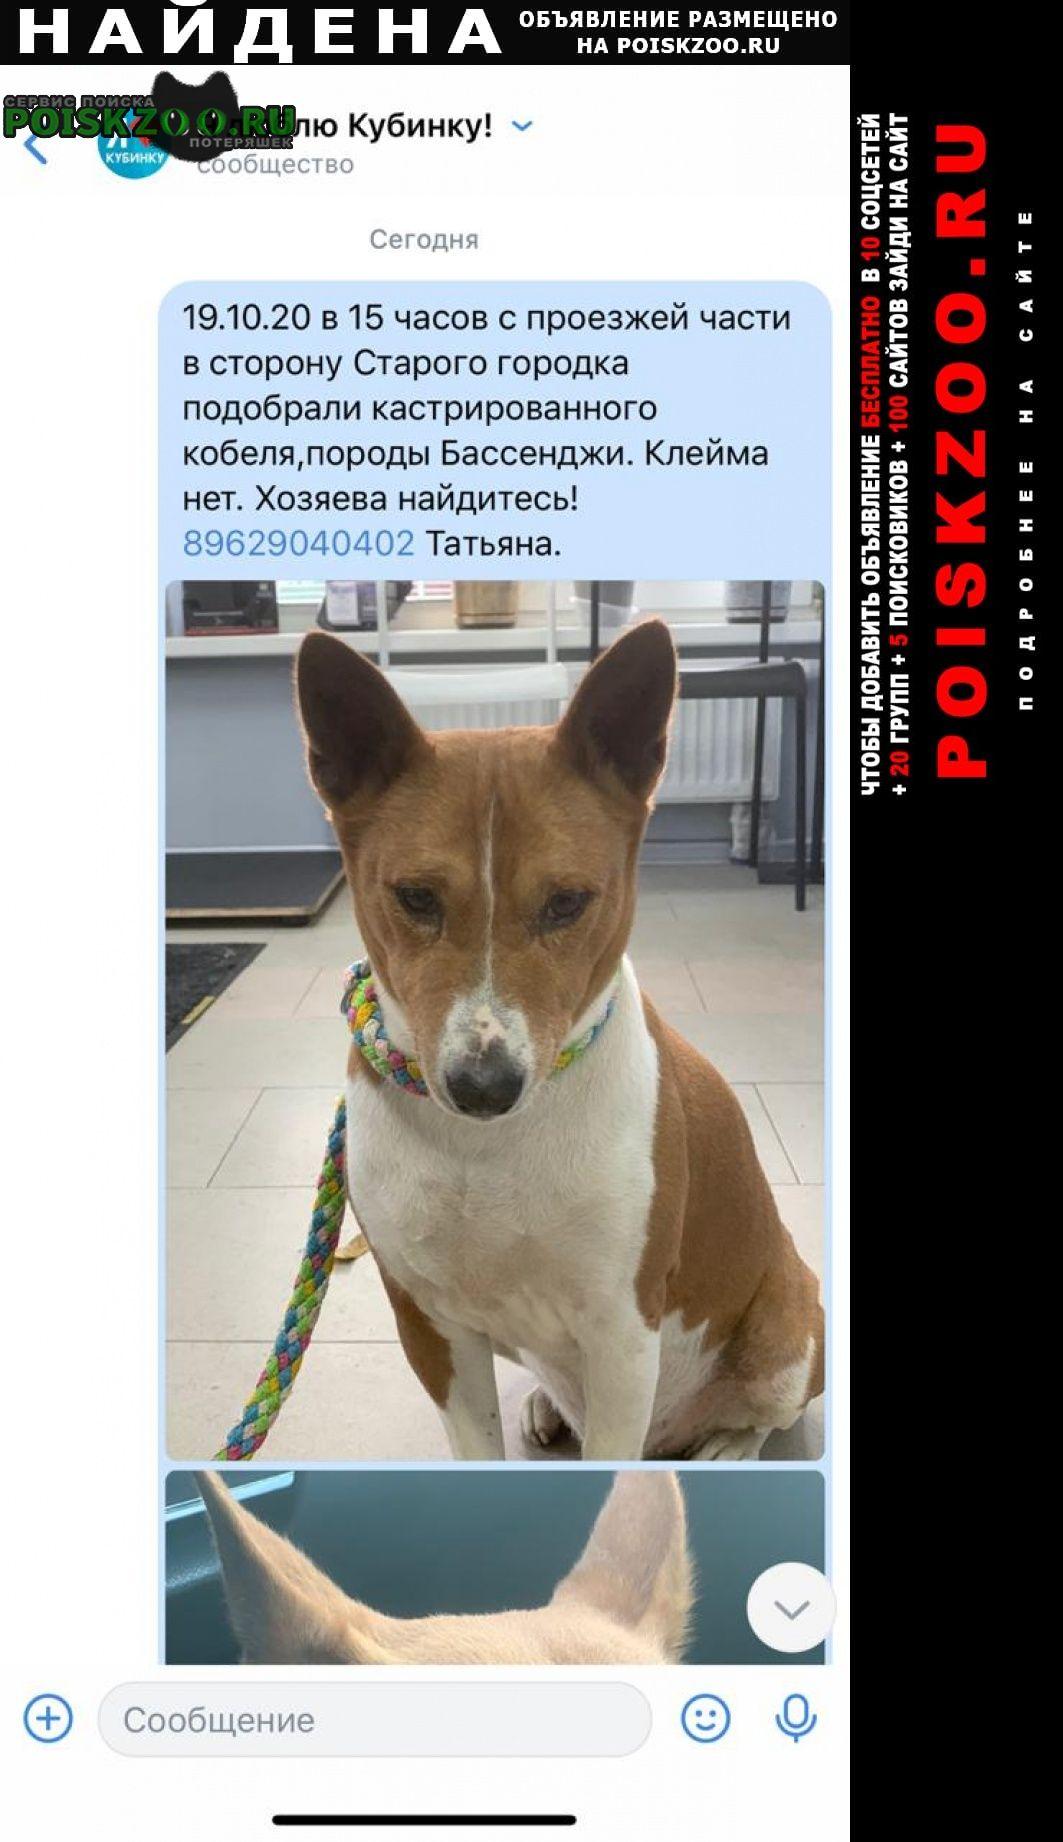 Найдена собака Кубинка